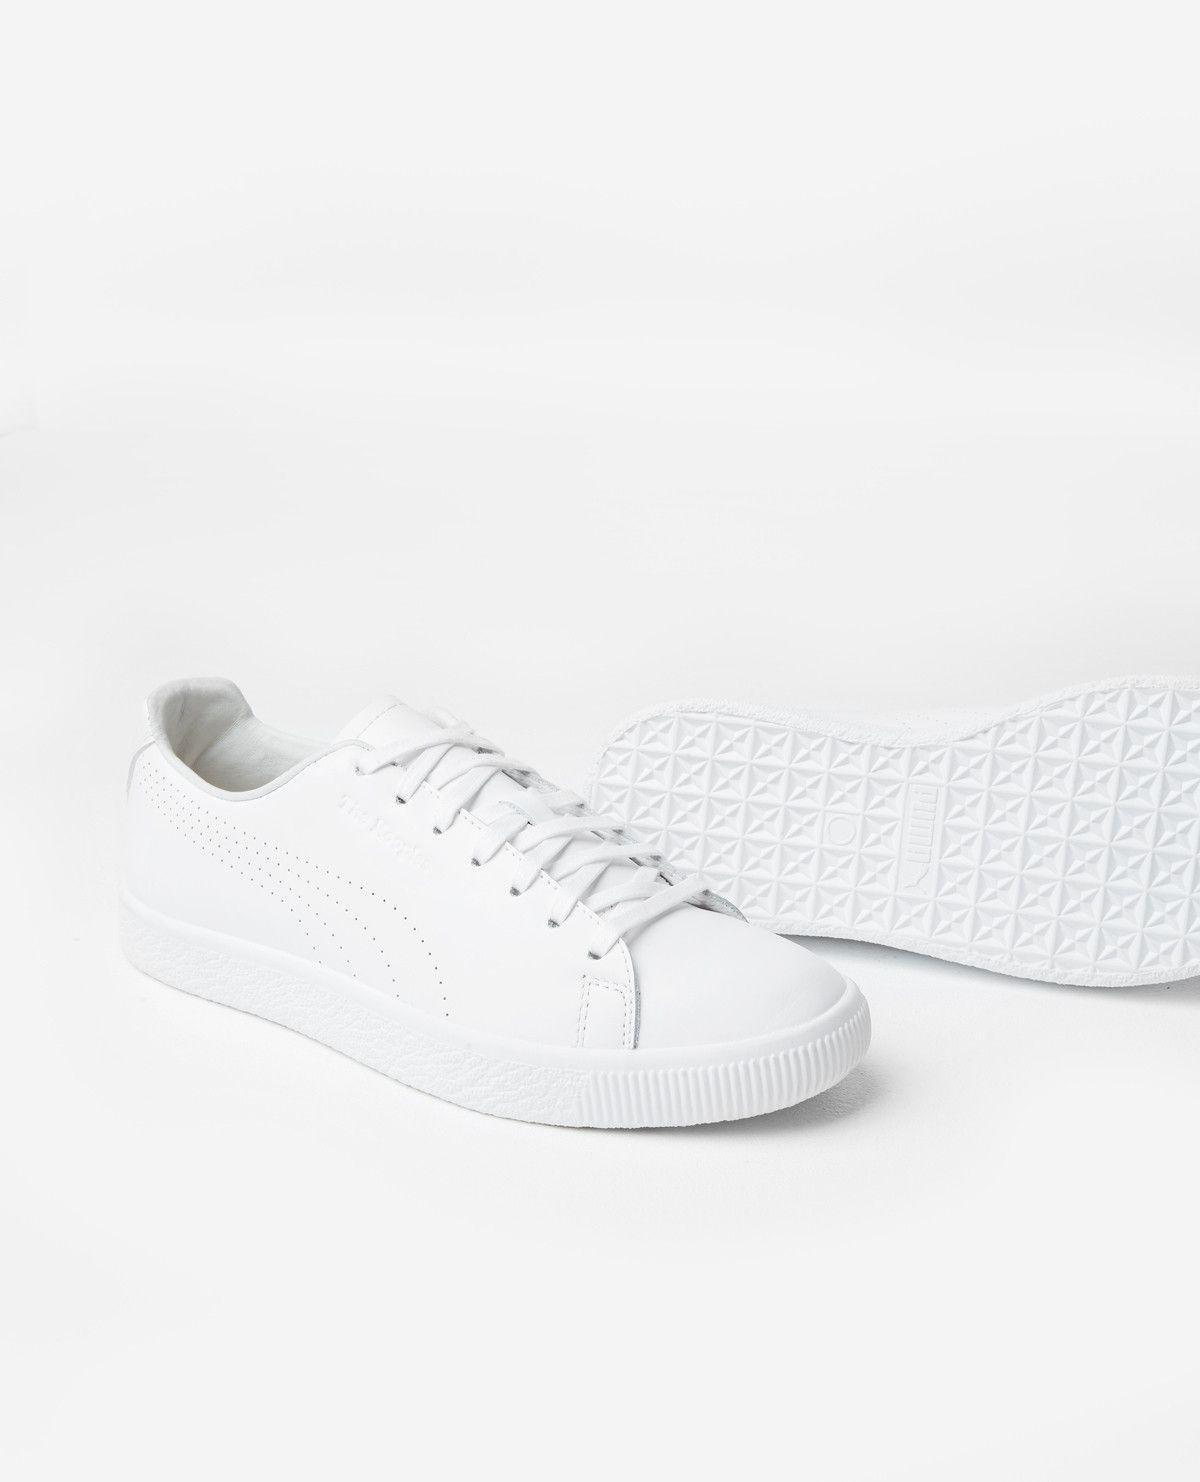 8d4a223e8bf Puma x The Kooples Clyde sneakers - Puma - The Kooples   Shoes ...